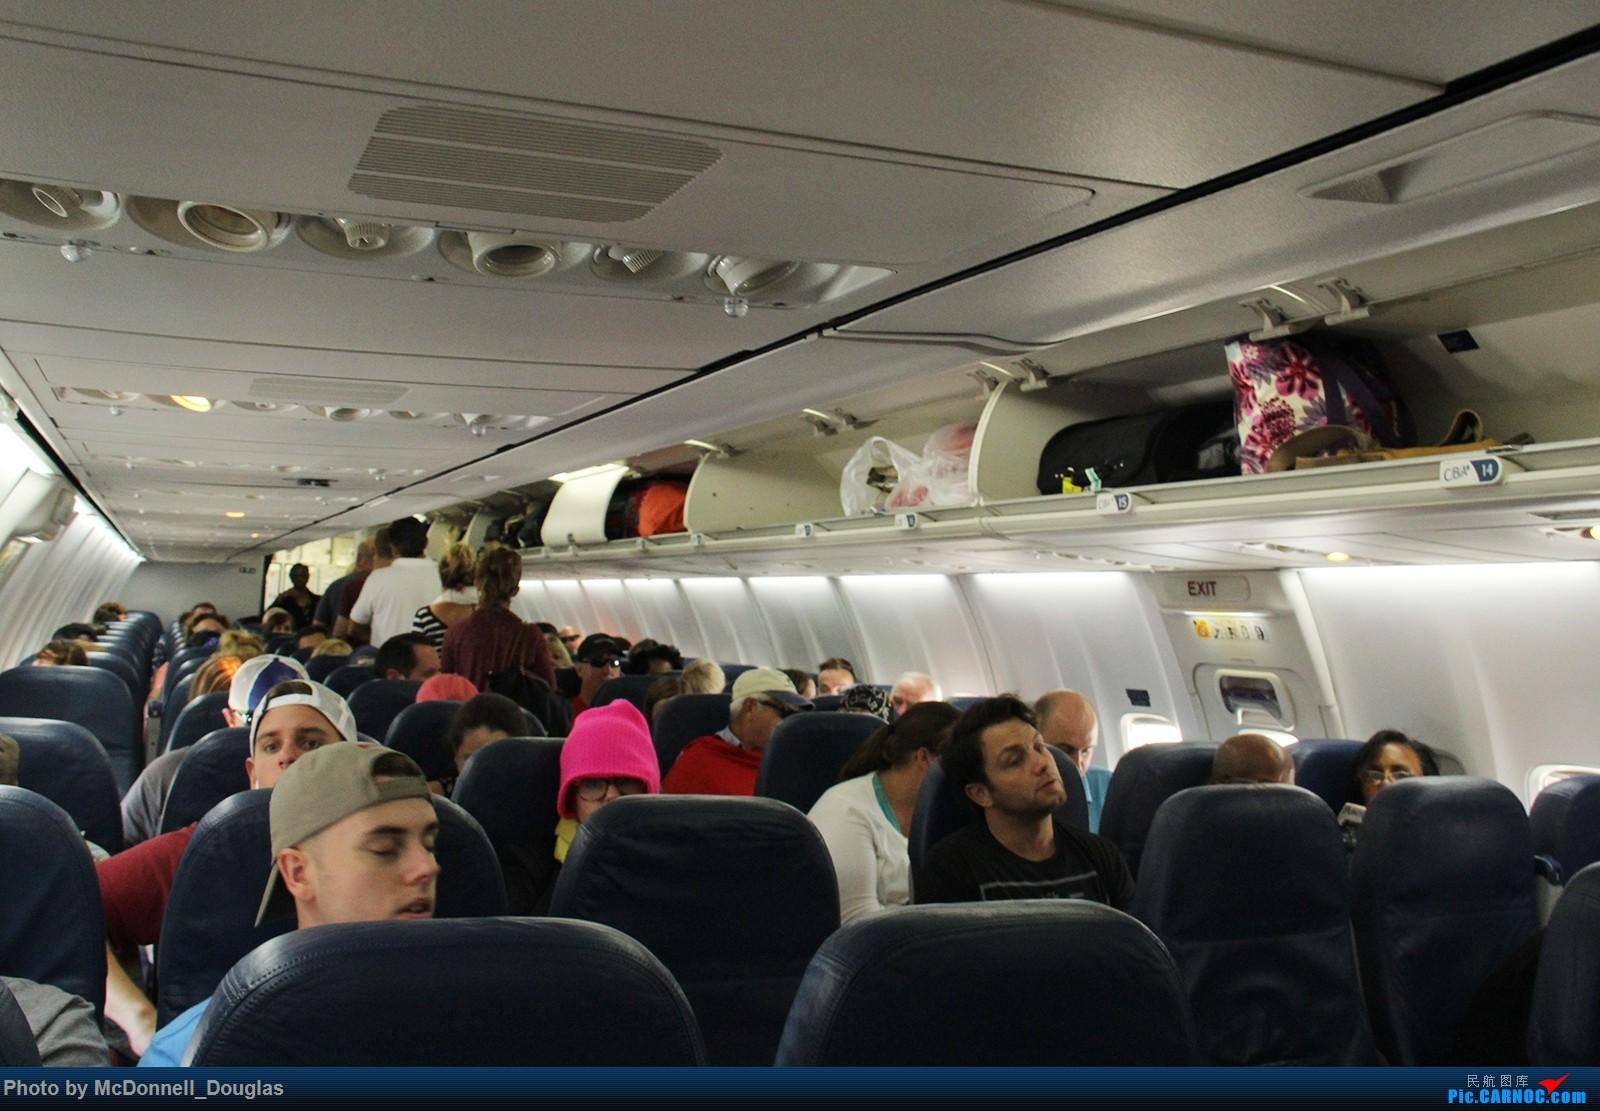 Re:[原创]【上海飞友会】图会很多,也有很多驾驶舱,杂七杂八的美帝,梦寐以求的圣马丁,这更绝不弃贴【驾驶舱已出现】【已更新至圣马丁部分】 BOEING737-732 N301DQ 美国亚特兰大哈兹菲尔德-杰克逊国际机场